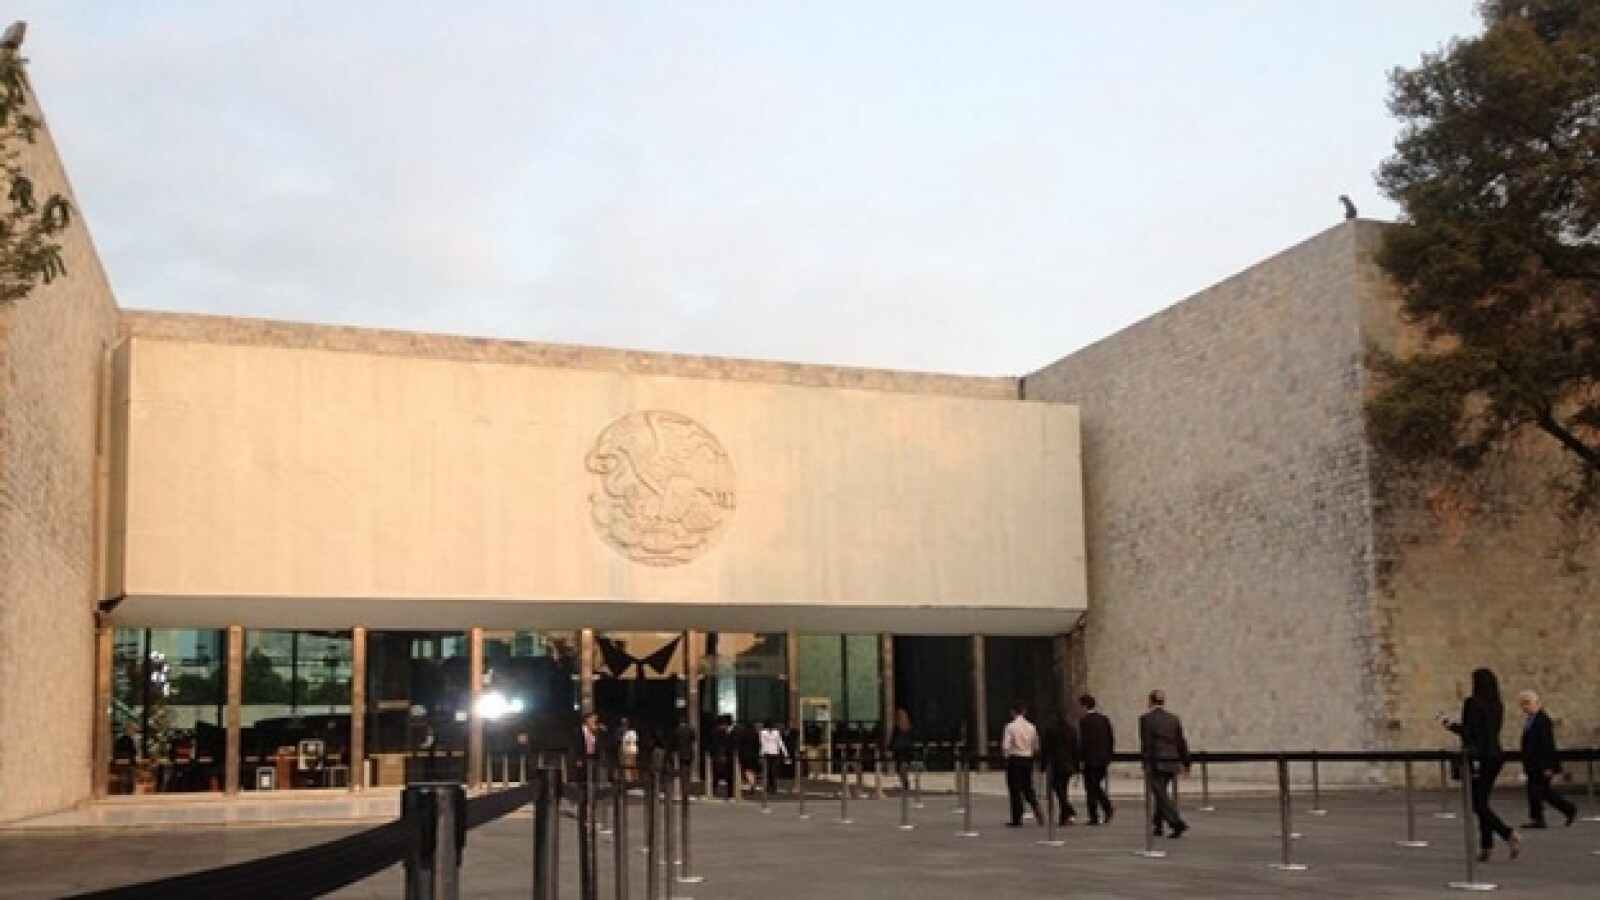 visita de barack obama al museo de antropologia